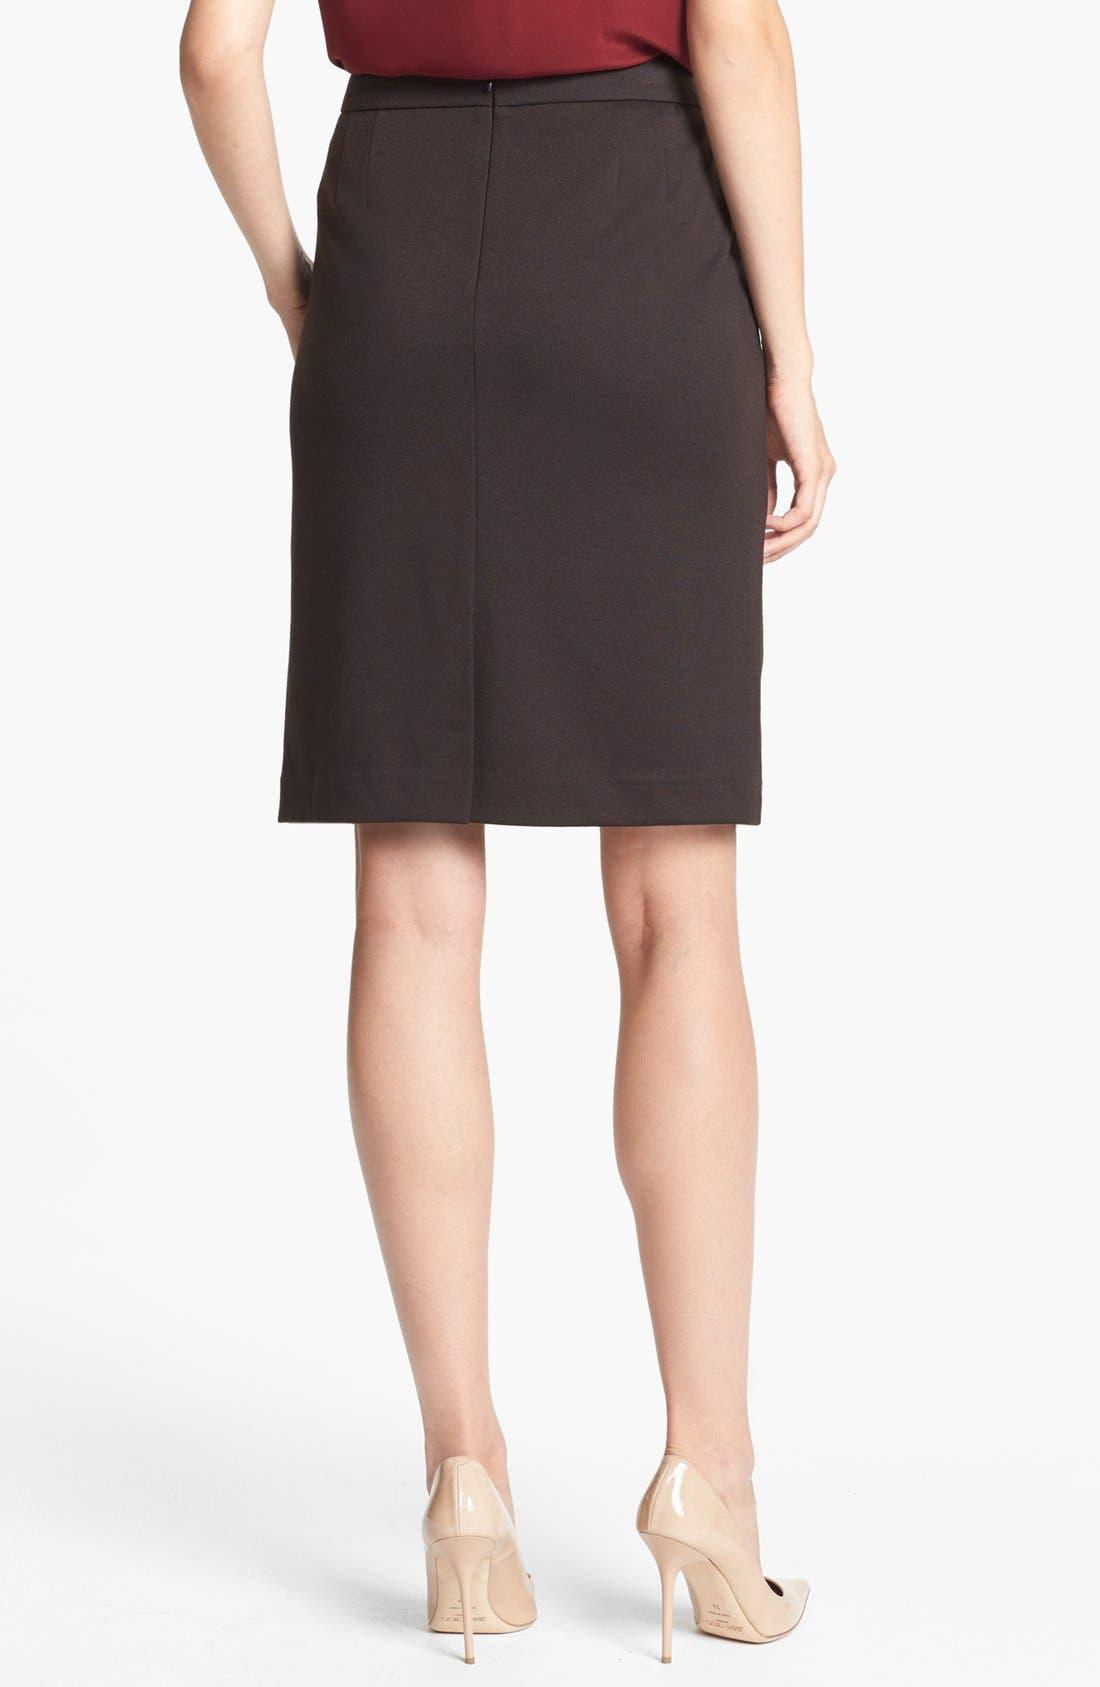 Alternate Image 2  - Jones New York 'Lucy' Ponte Knit Pencil Skirt